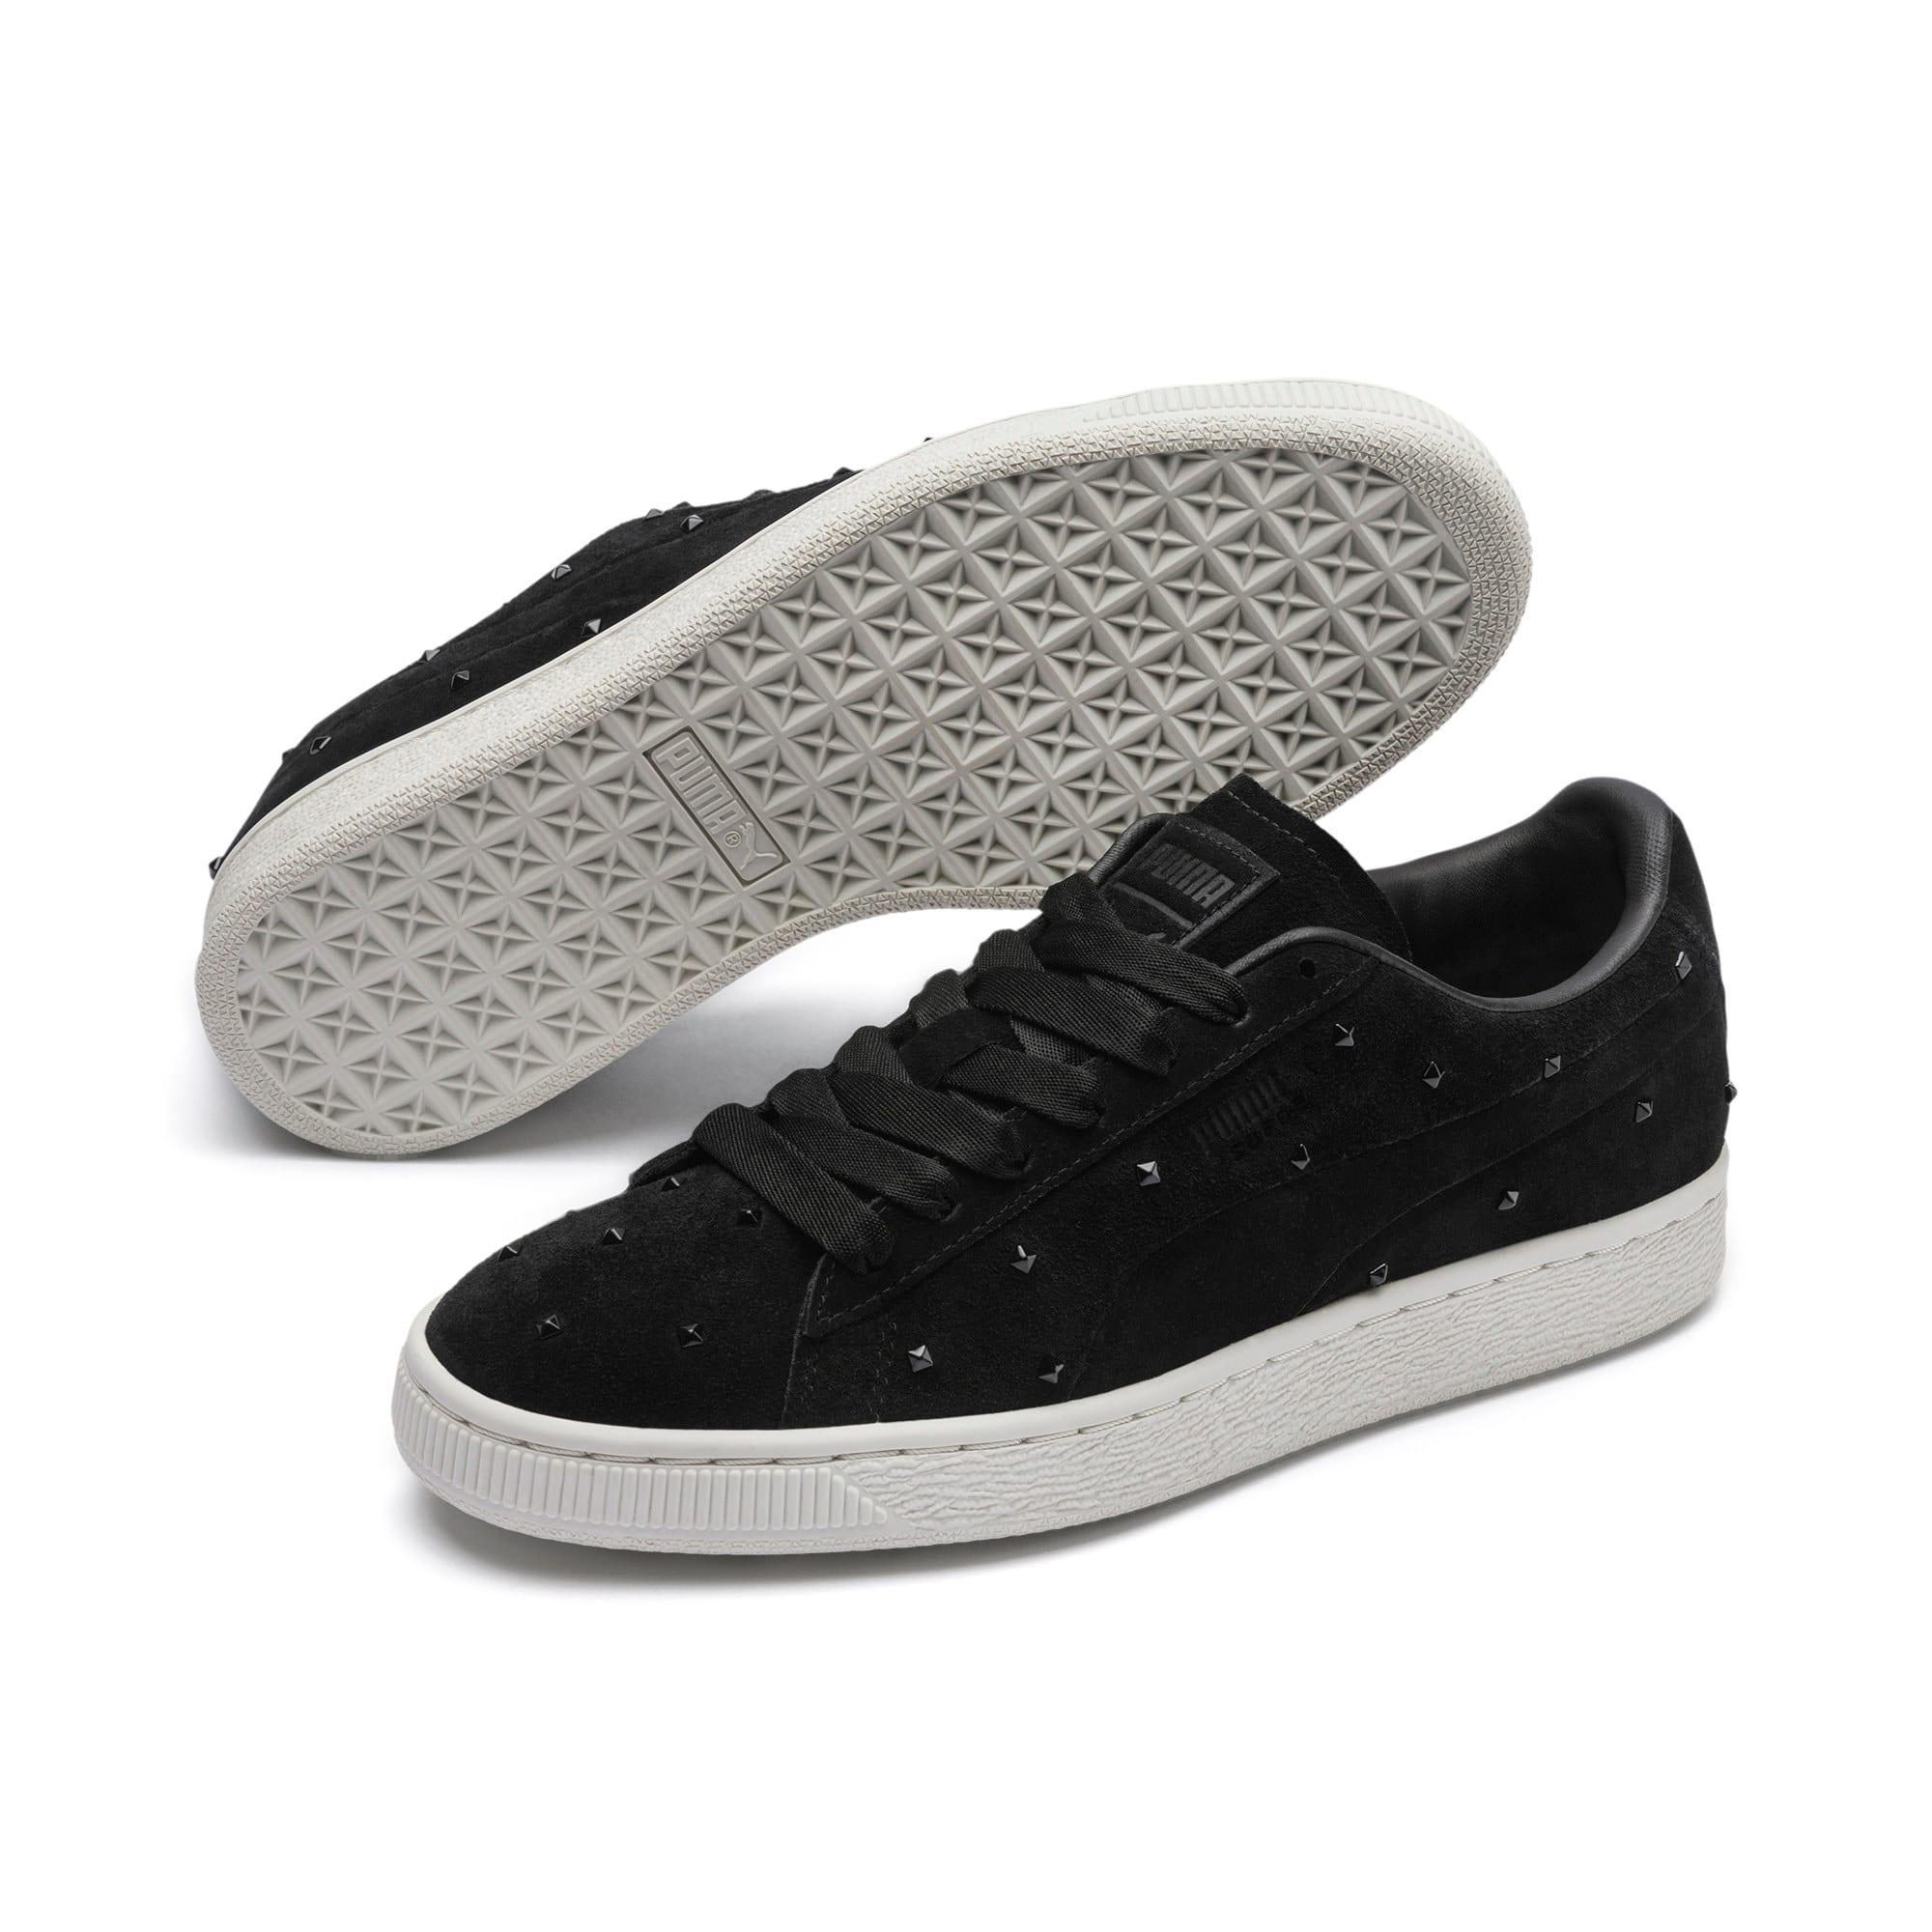 Thumbnail 3 of Suede Studs Damen Sneaker, Puma Black-Marshmallow, medium